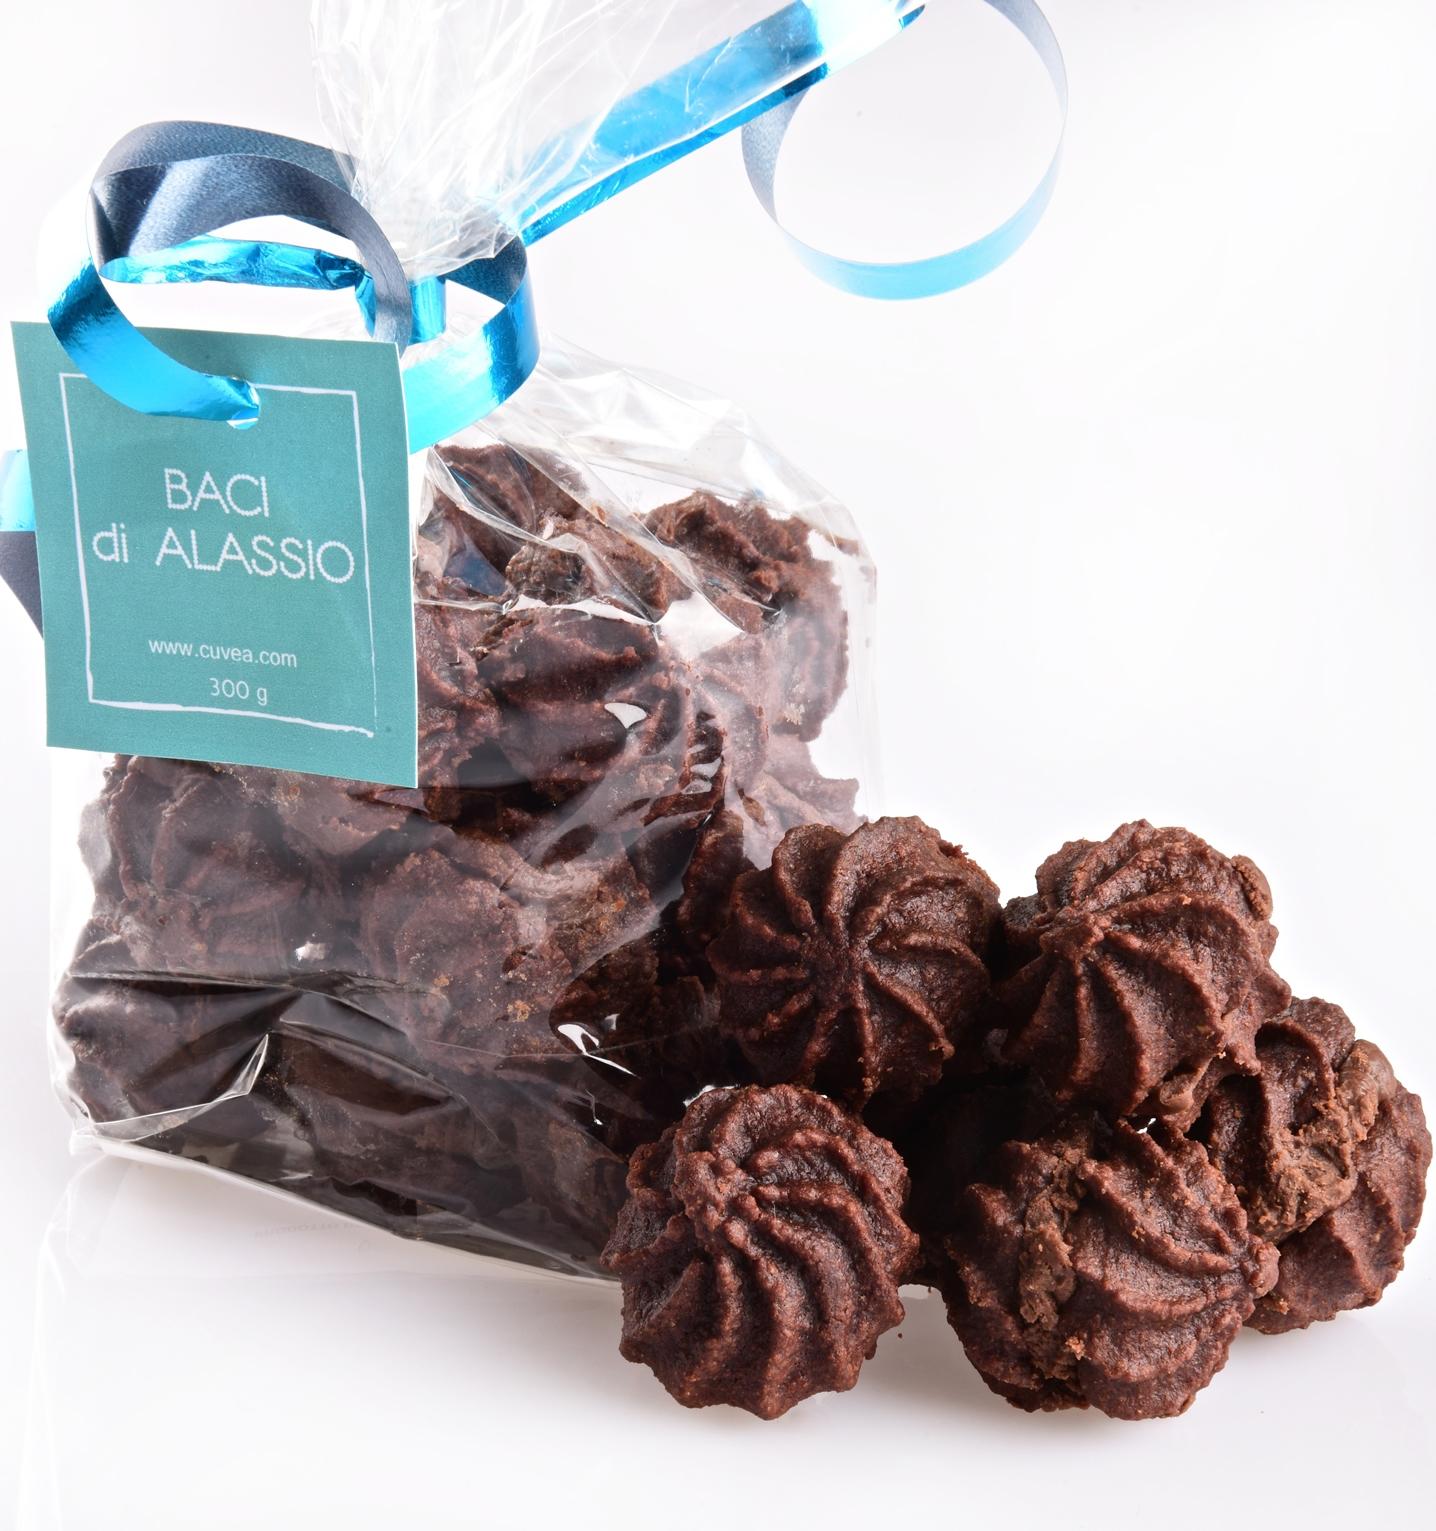 Baci di Alassio - 300 g